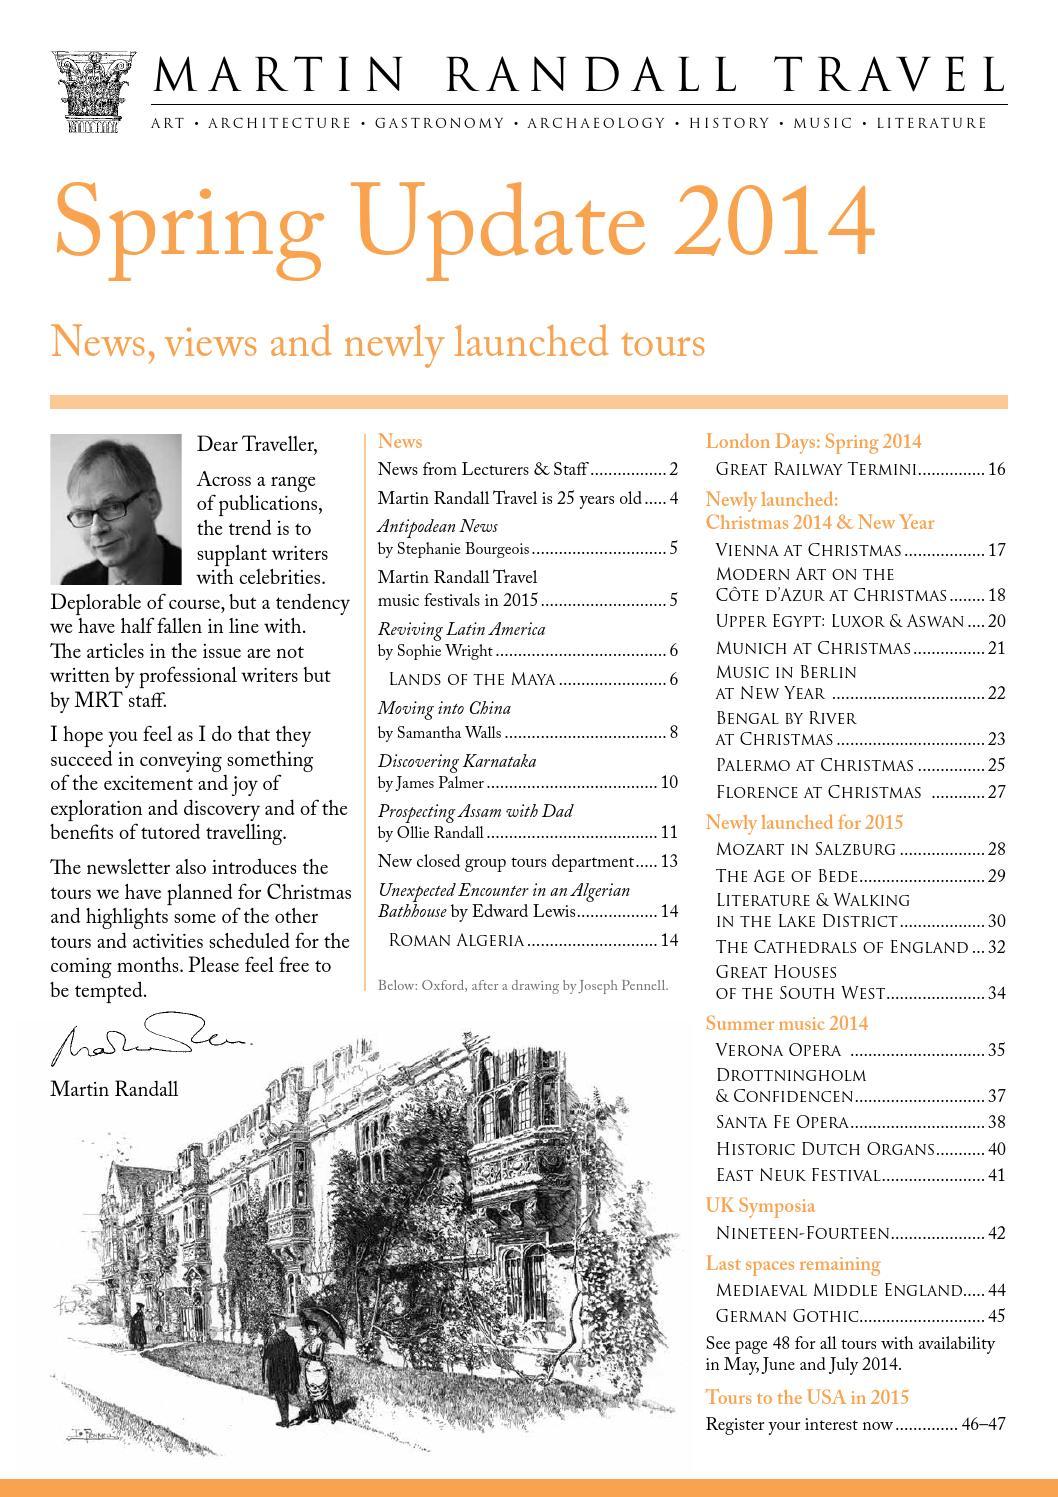 Spring Update 2014 by Martin Randall Travel - issuu